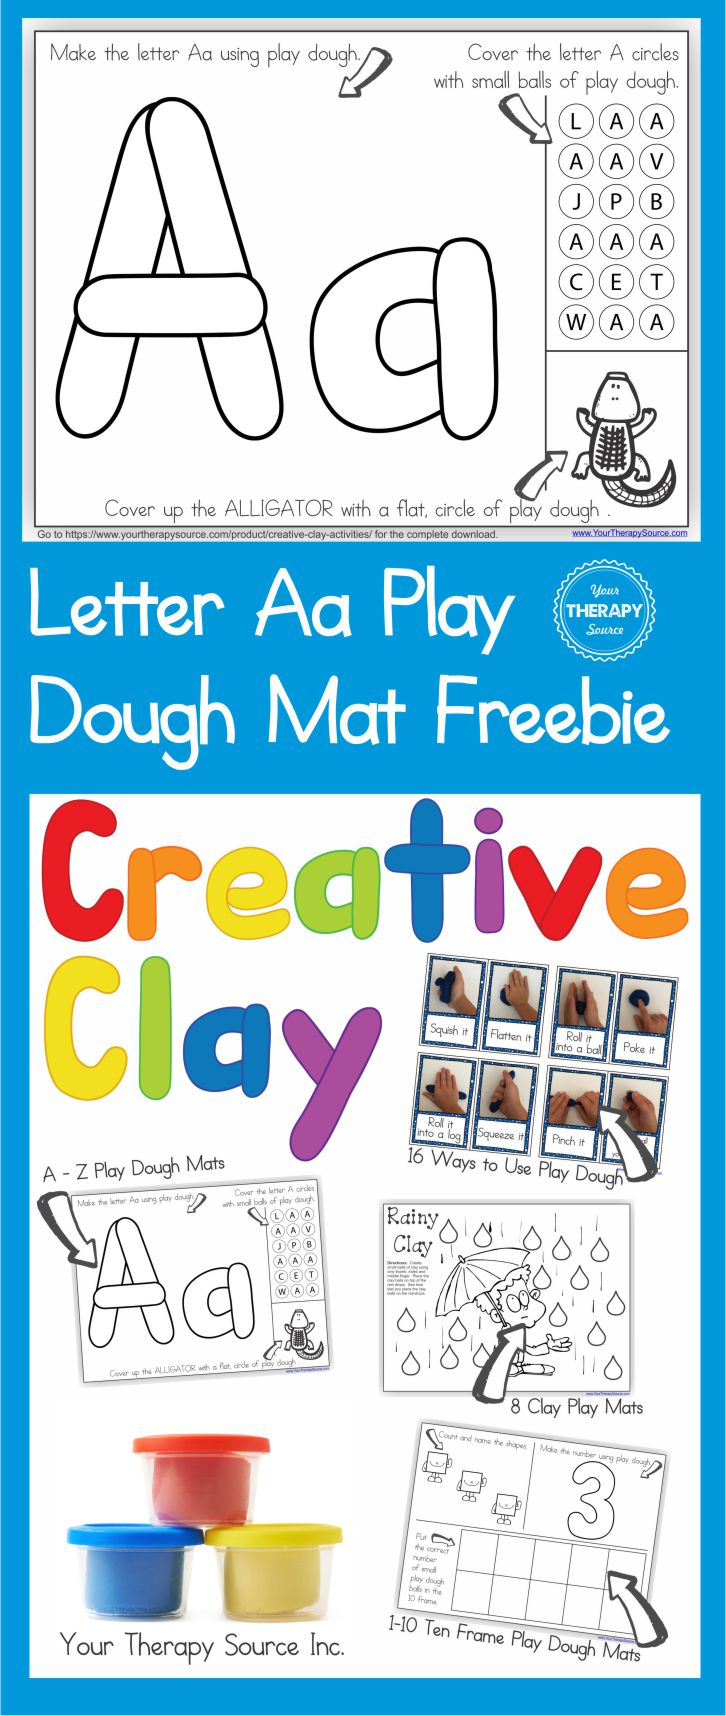 Alphabet Playdough Mat Letter Aa and More